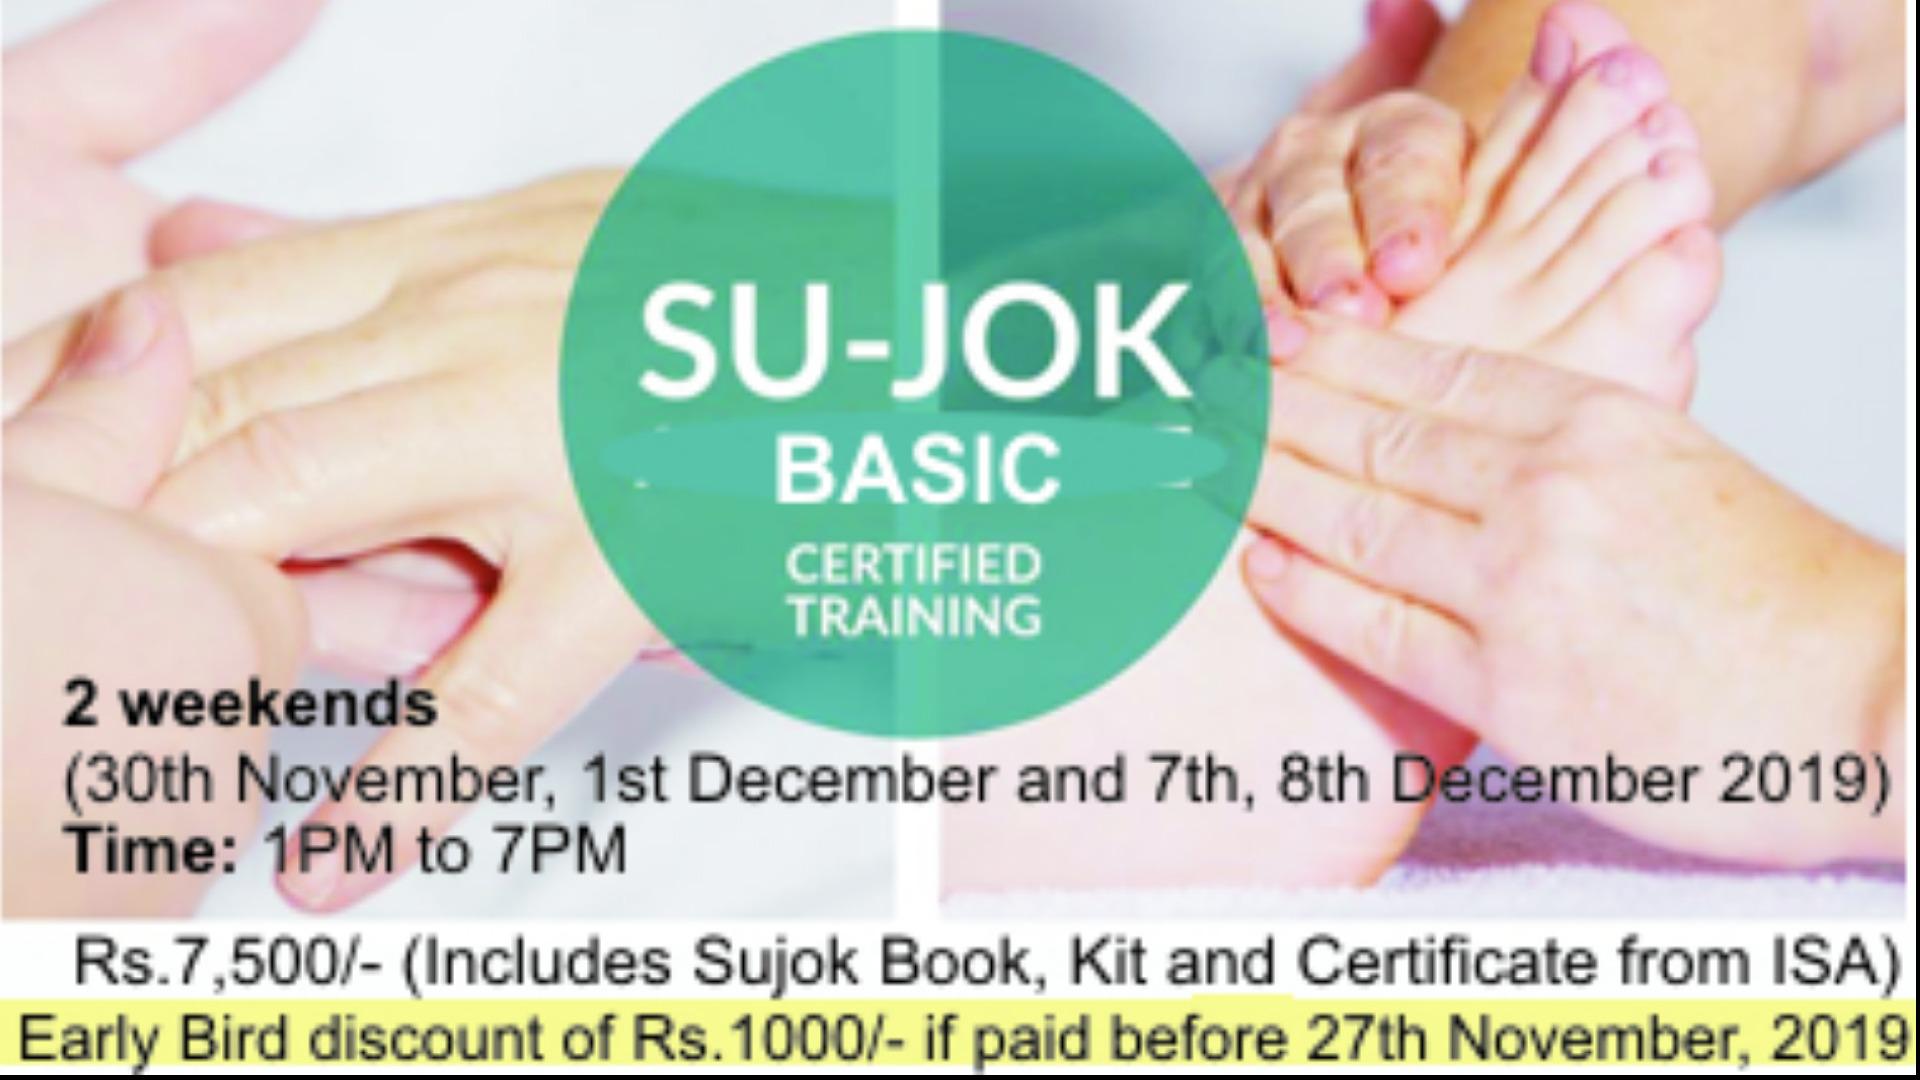 Sujok Therapy Training - Basic Level - (Over 2 weekends ...